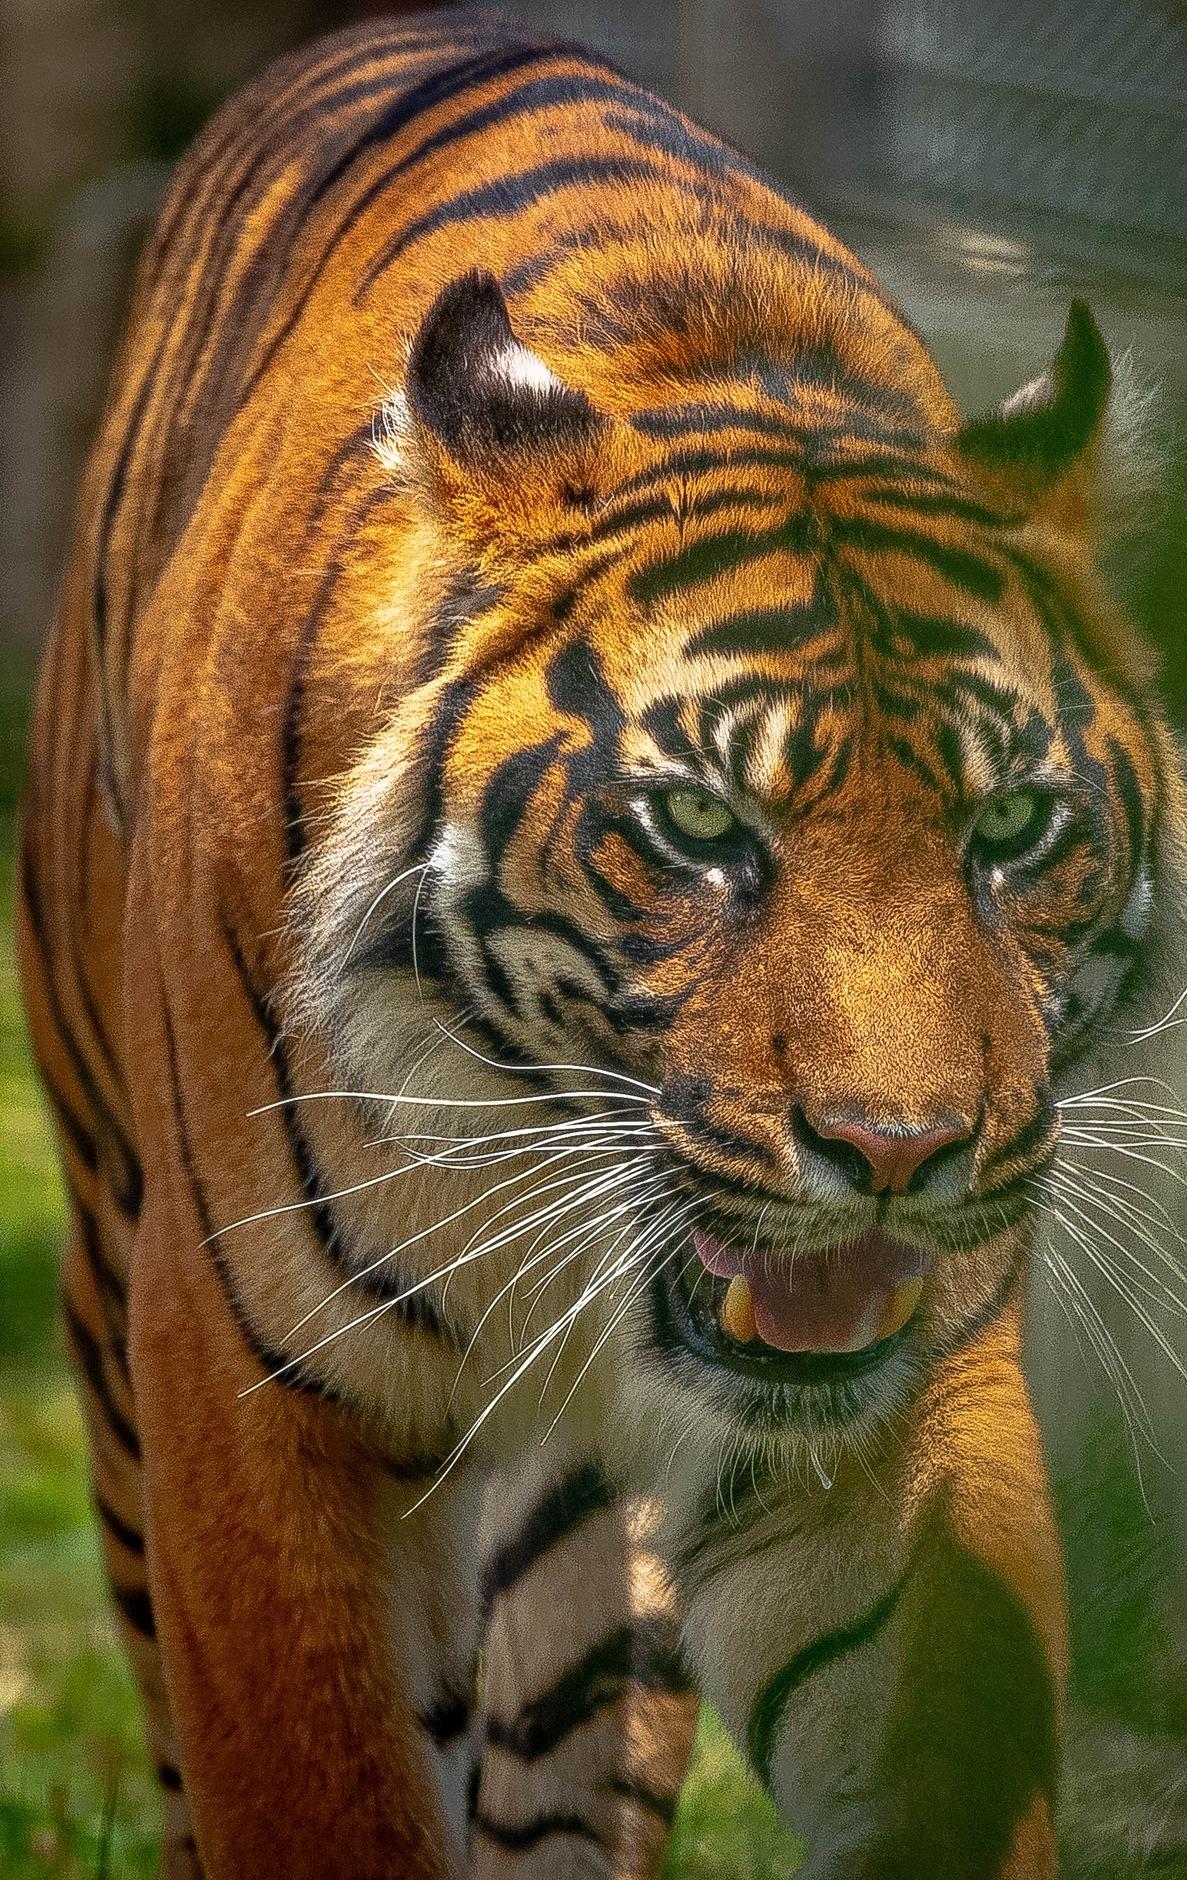 Majestic tiger.